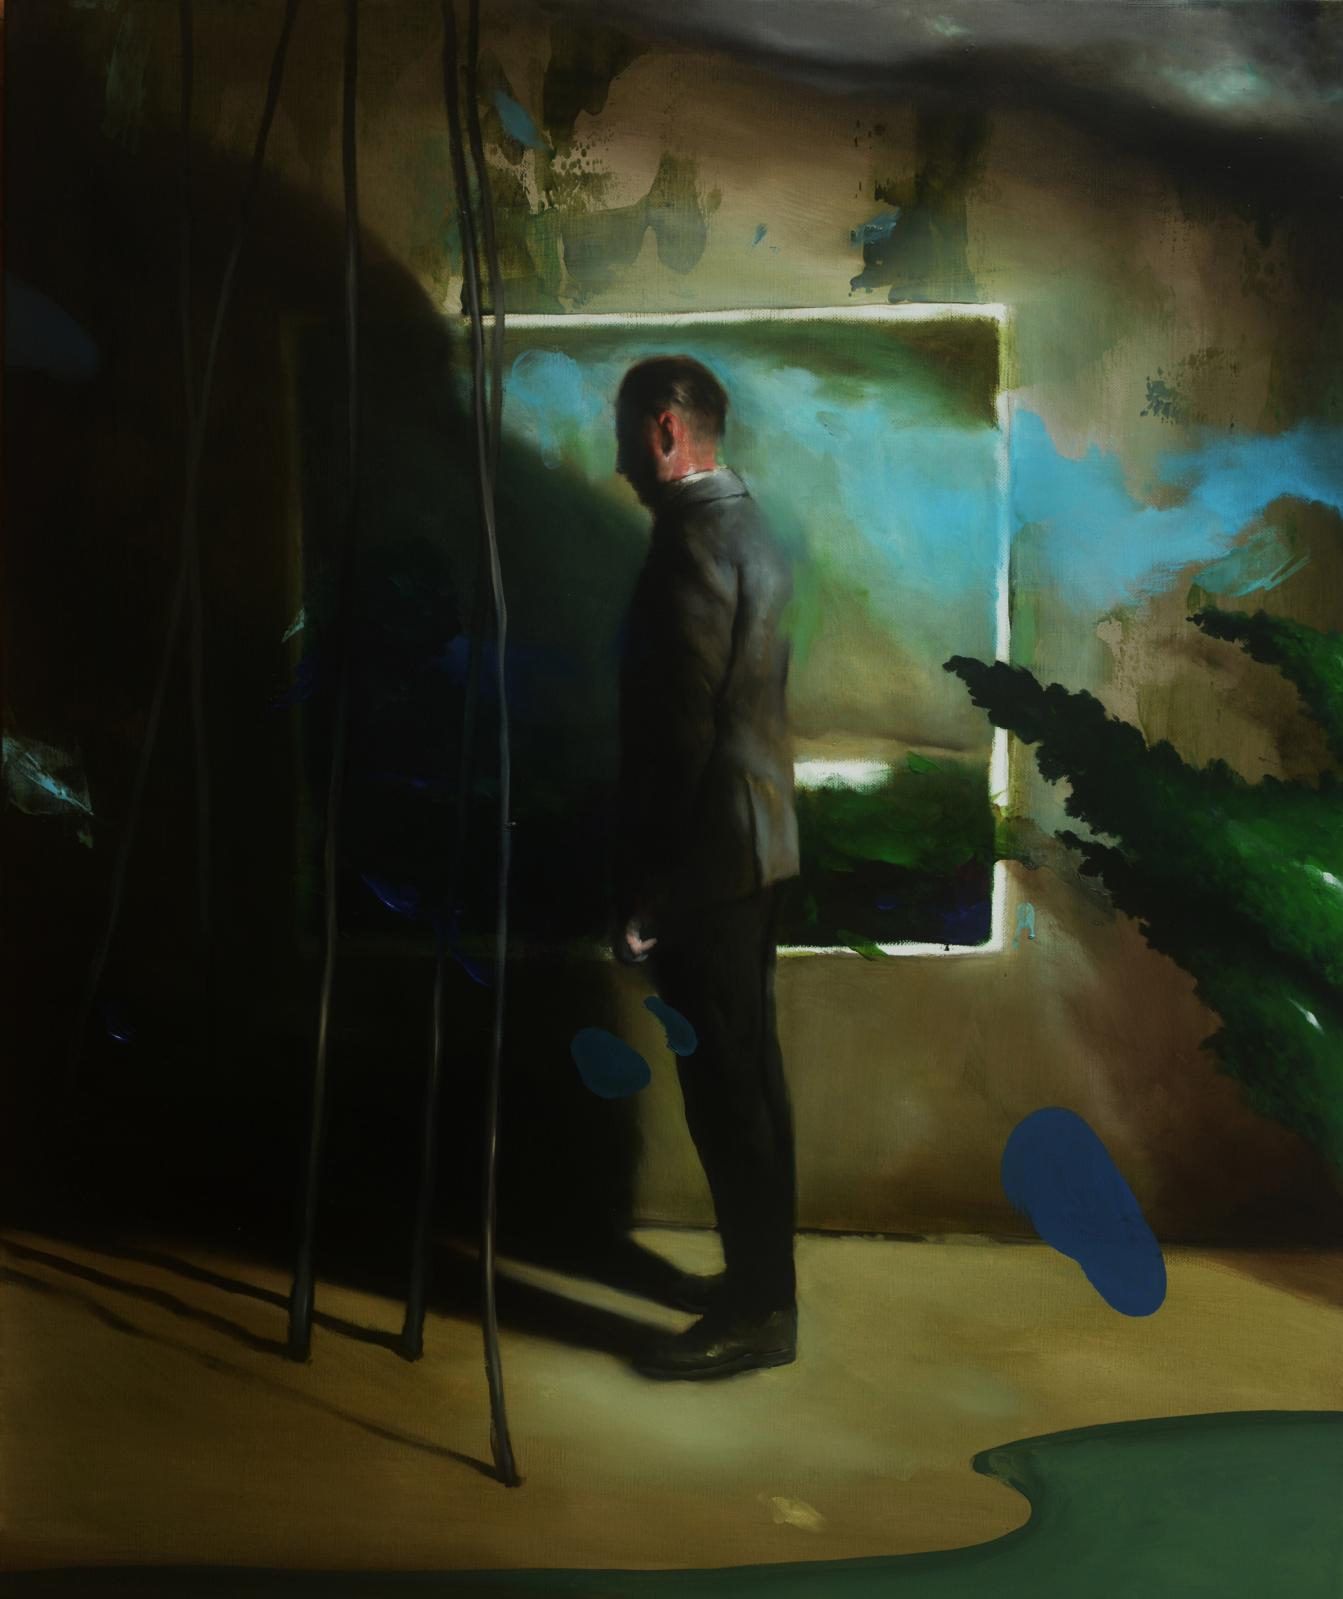 Radu Belcin, Memories, 2018, huile sur toile, 95x80cm. © Galerie Valérie Delaunay